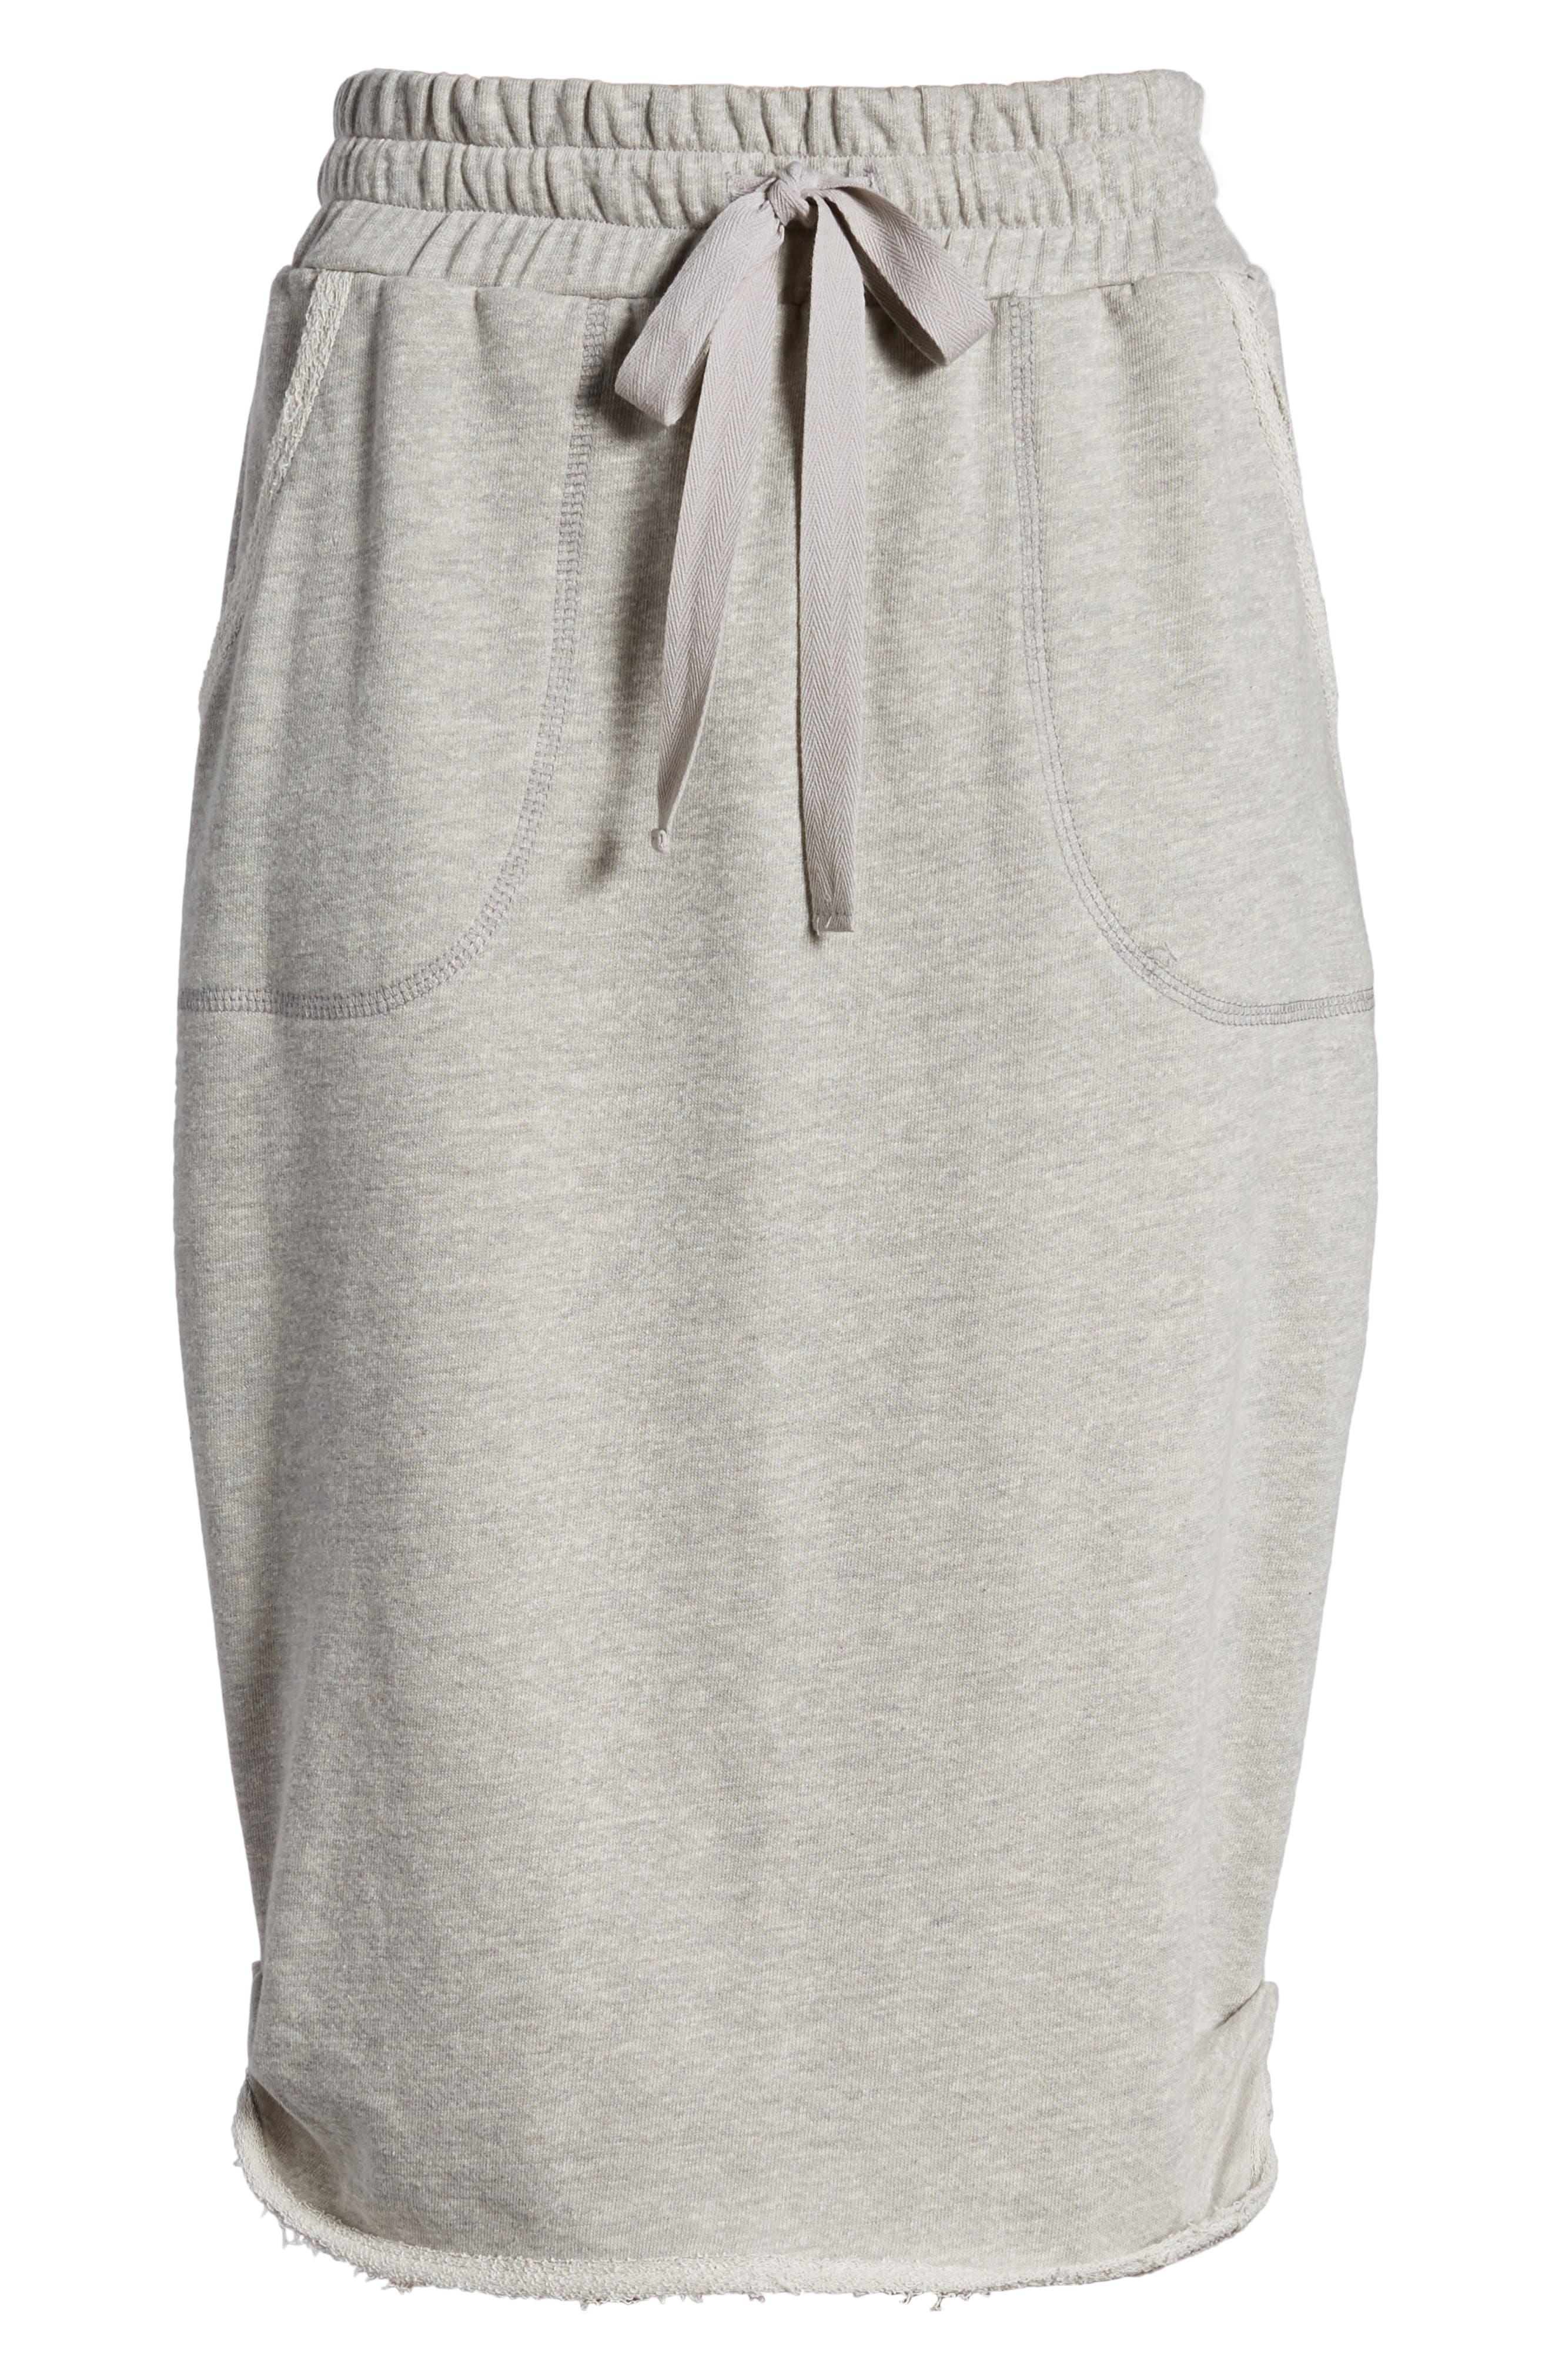 Off-Duty Cotton Knit Drawstring Skirt,                             Alternate thumbnail 5, color,                             Grey Heather